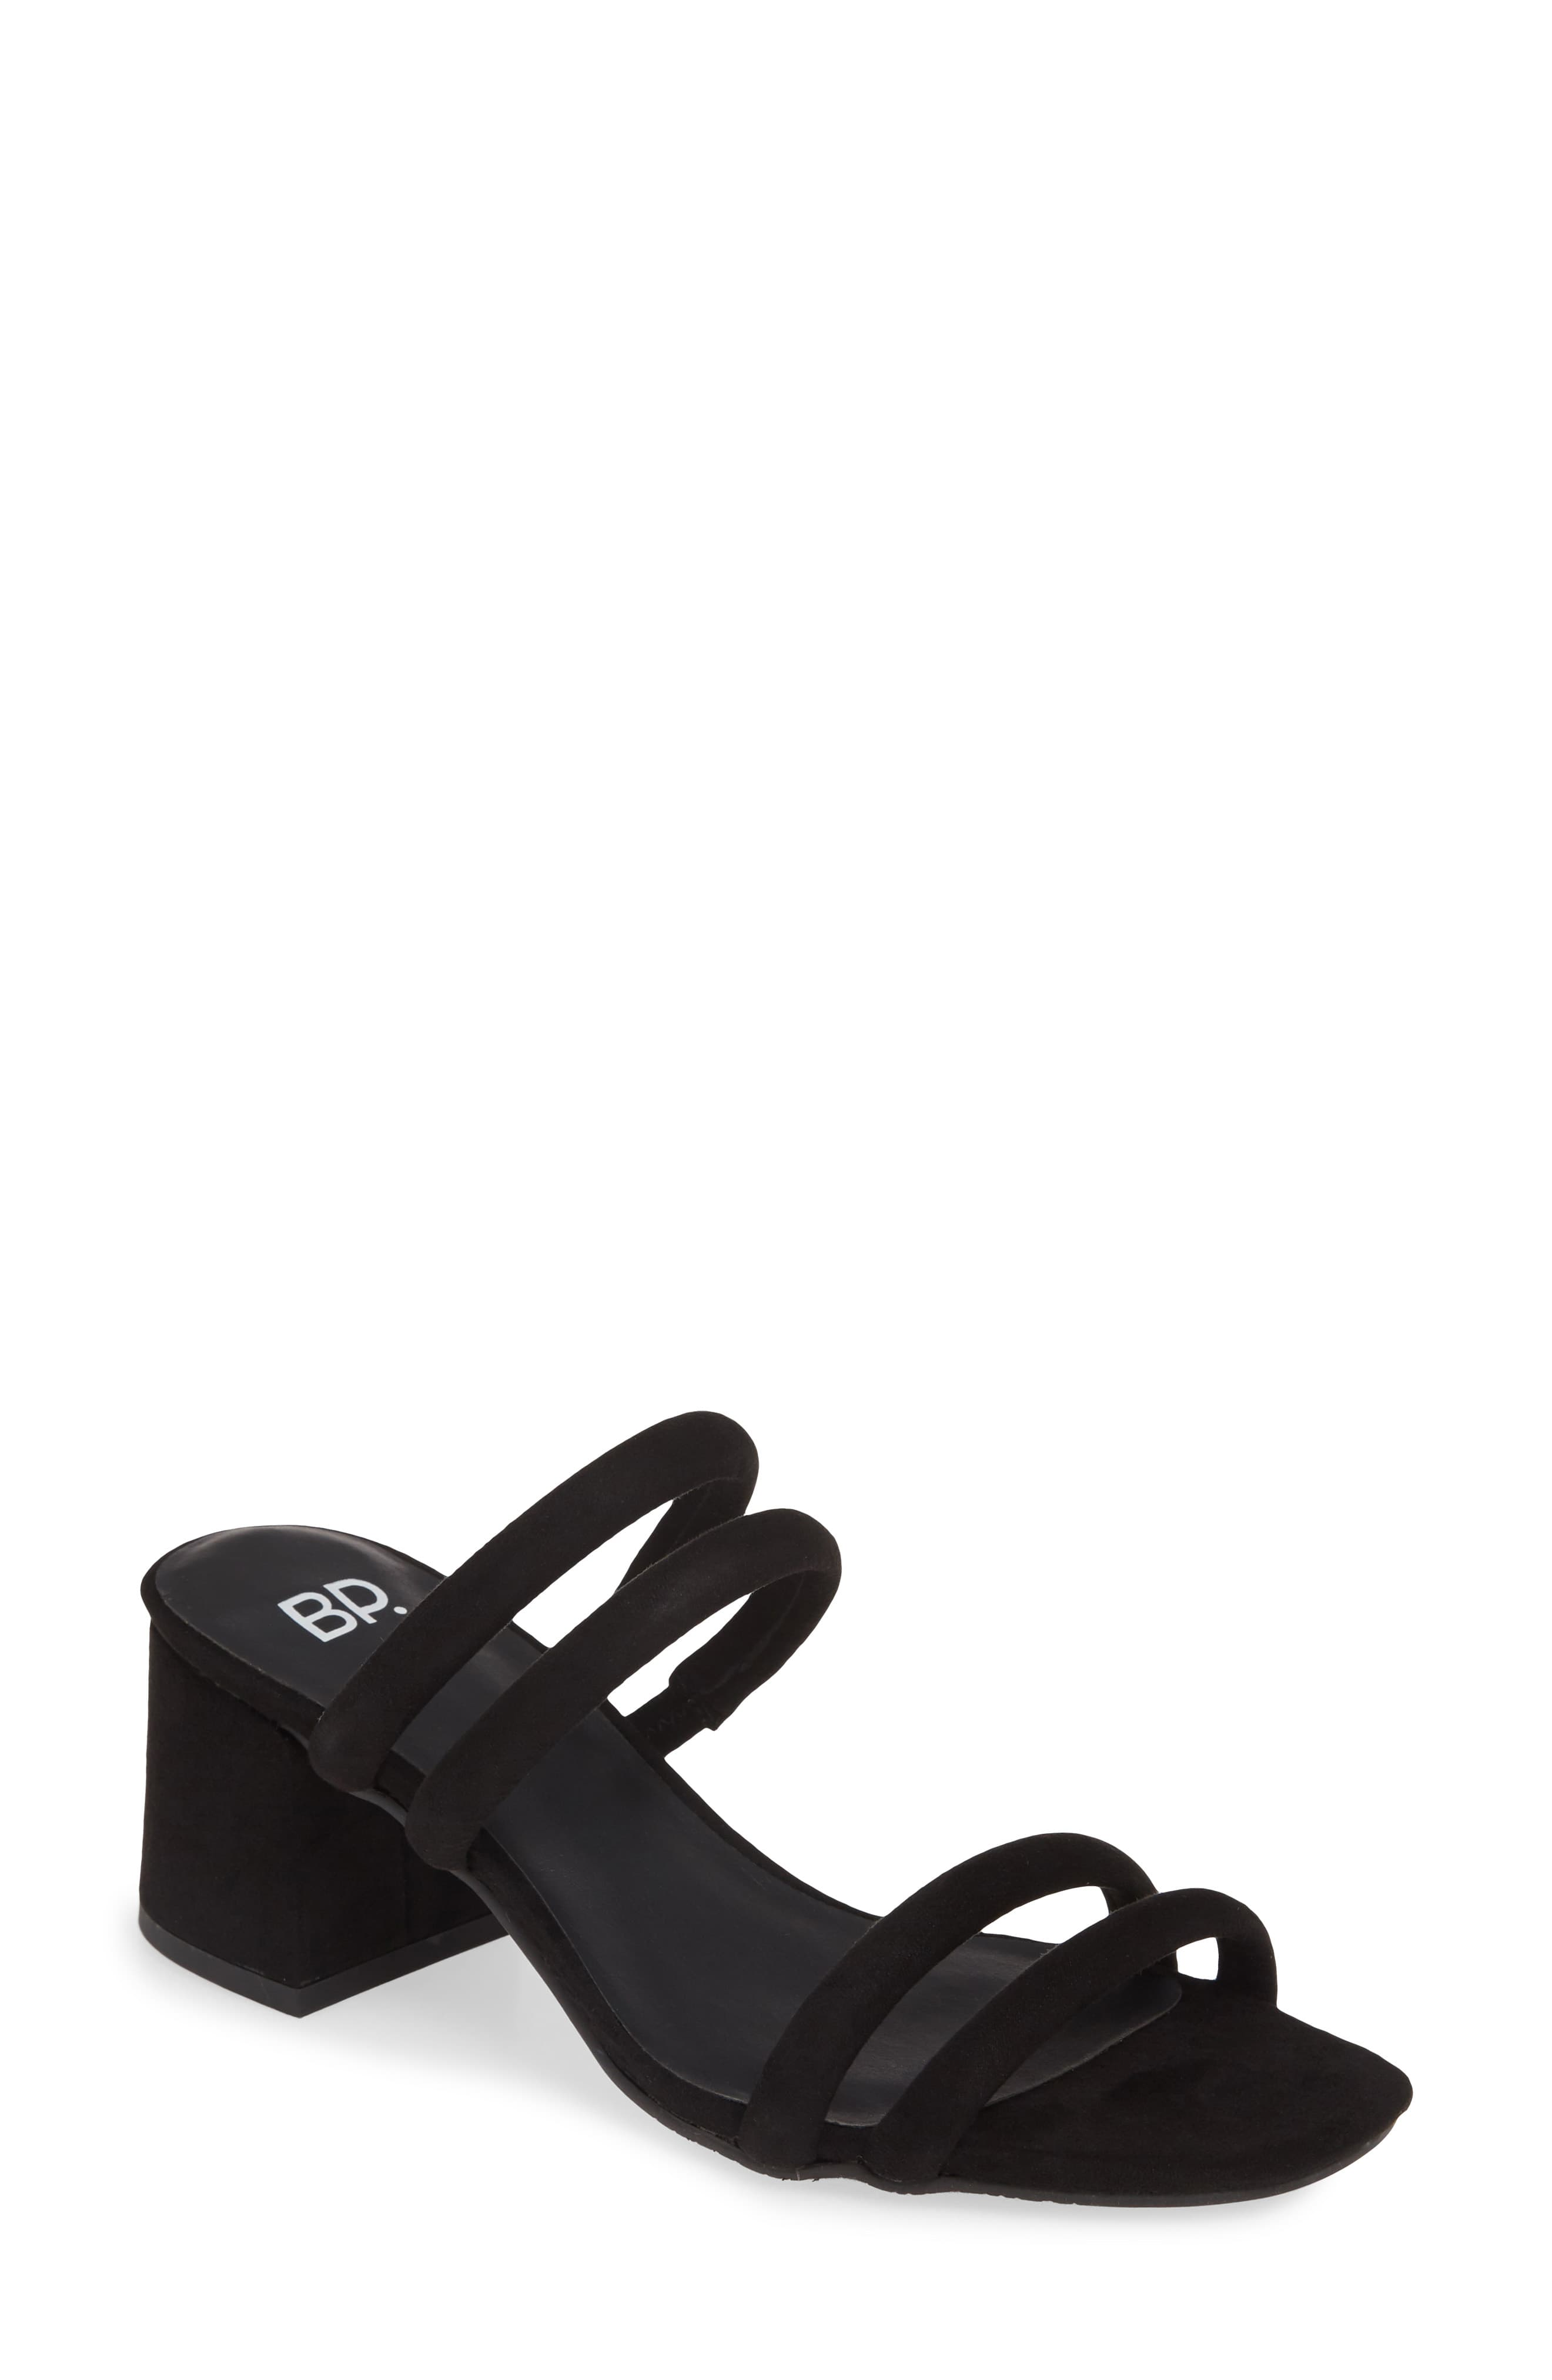 8b94d033fd2 Women's Bp. Lucia Block Heel Slide Sandal, Size 5 M - Black in 2019 ...